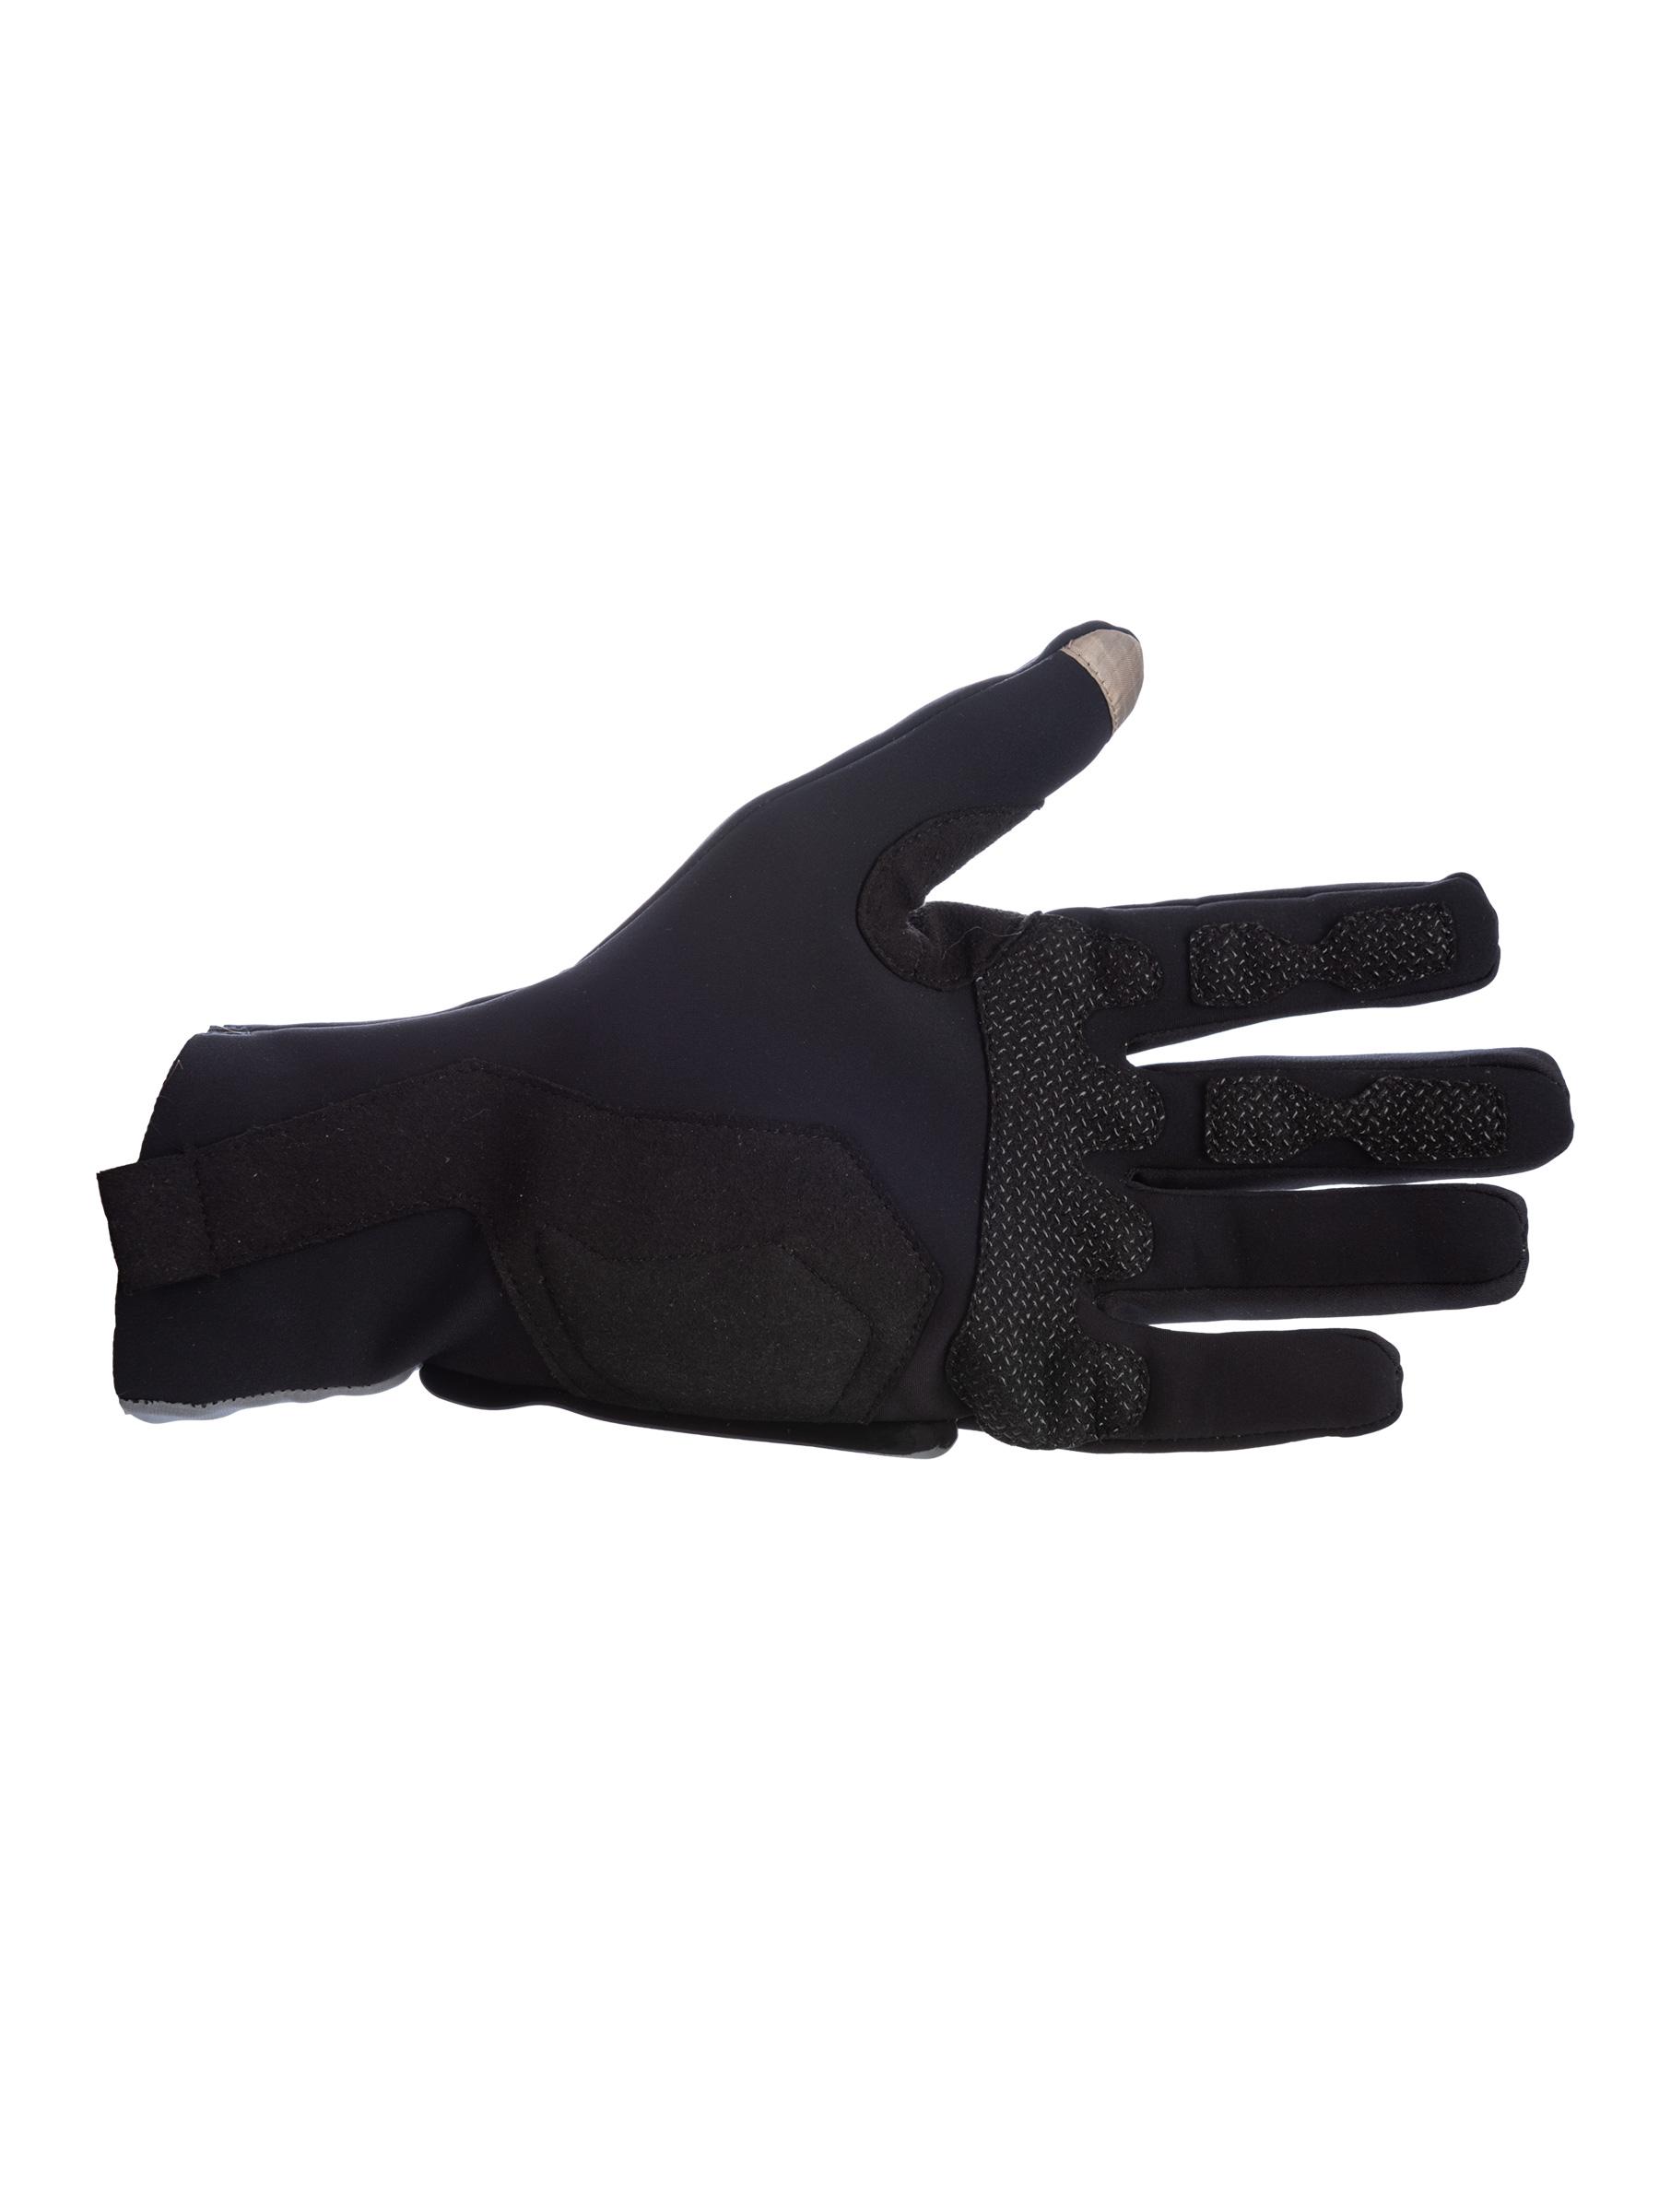 Radhandschuhe Termico Glove X